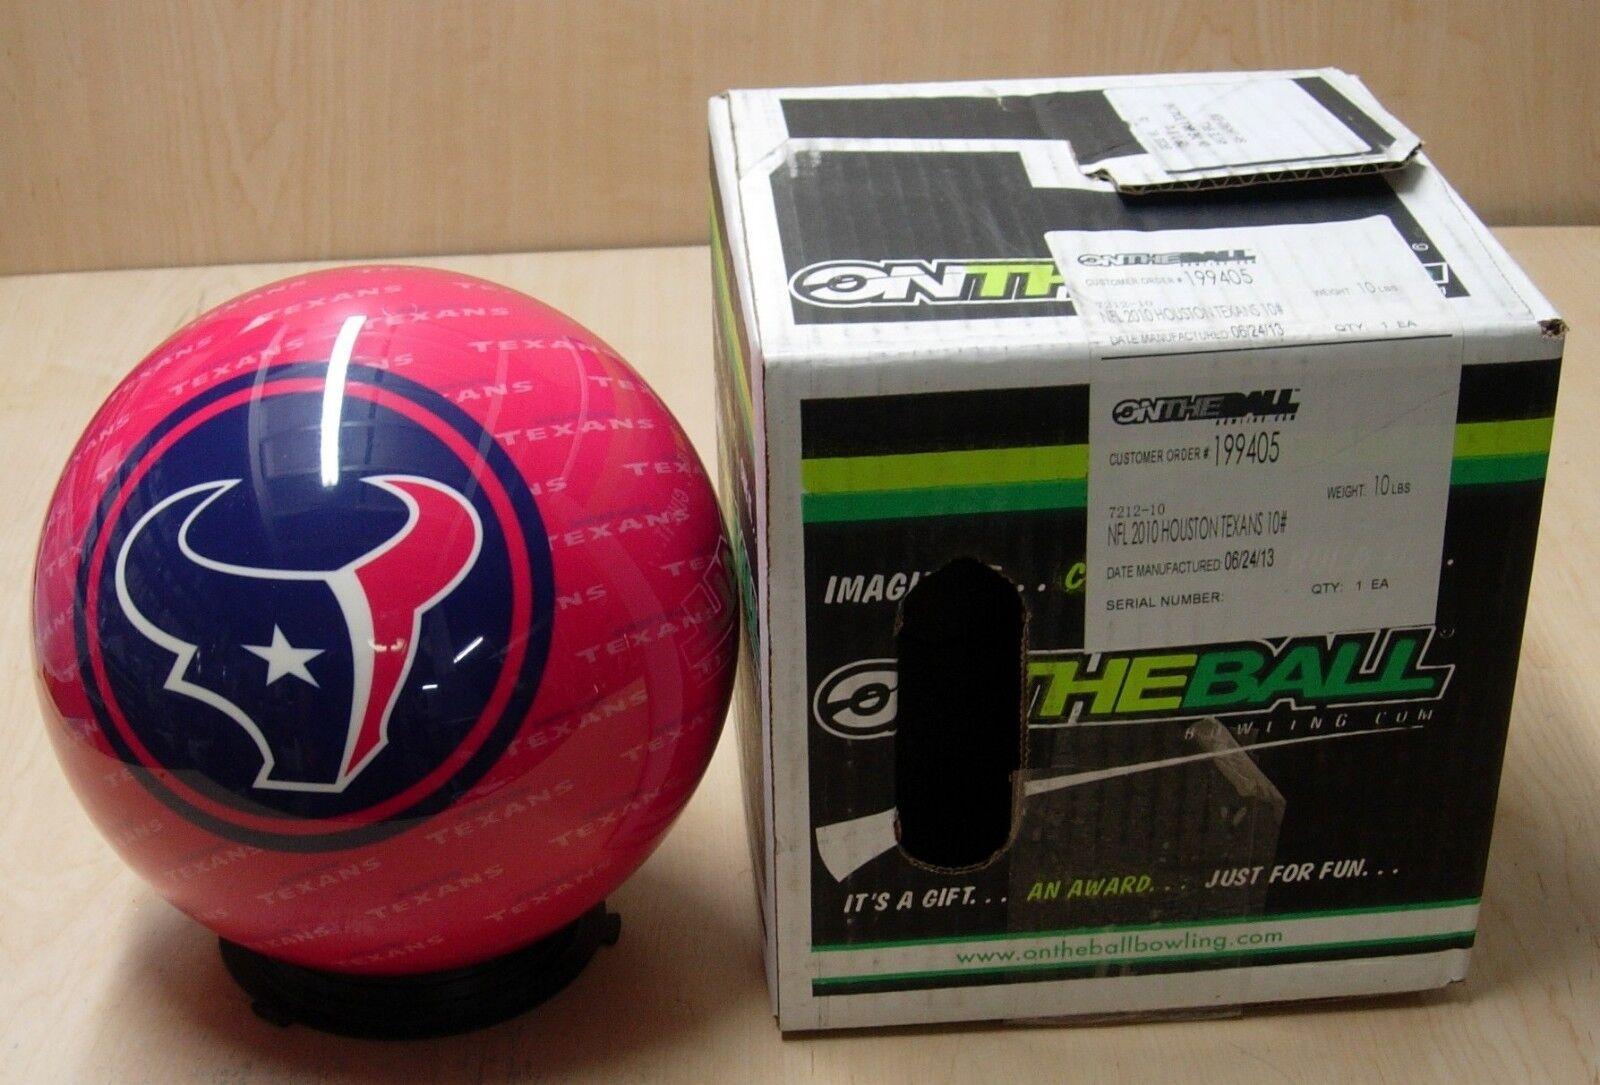 = 10TW 1.8 Bowling Ball OTBB Viz-A-Ball Retired 2010 Houston TEXANS M06 24 13